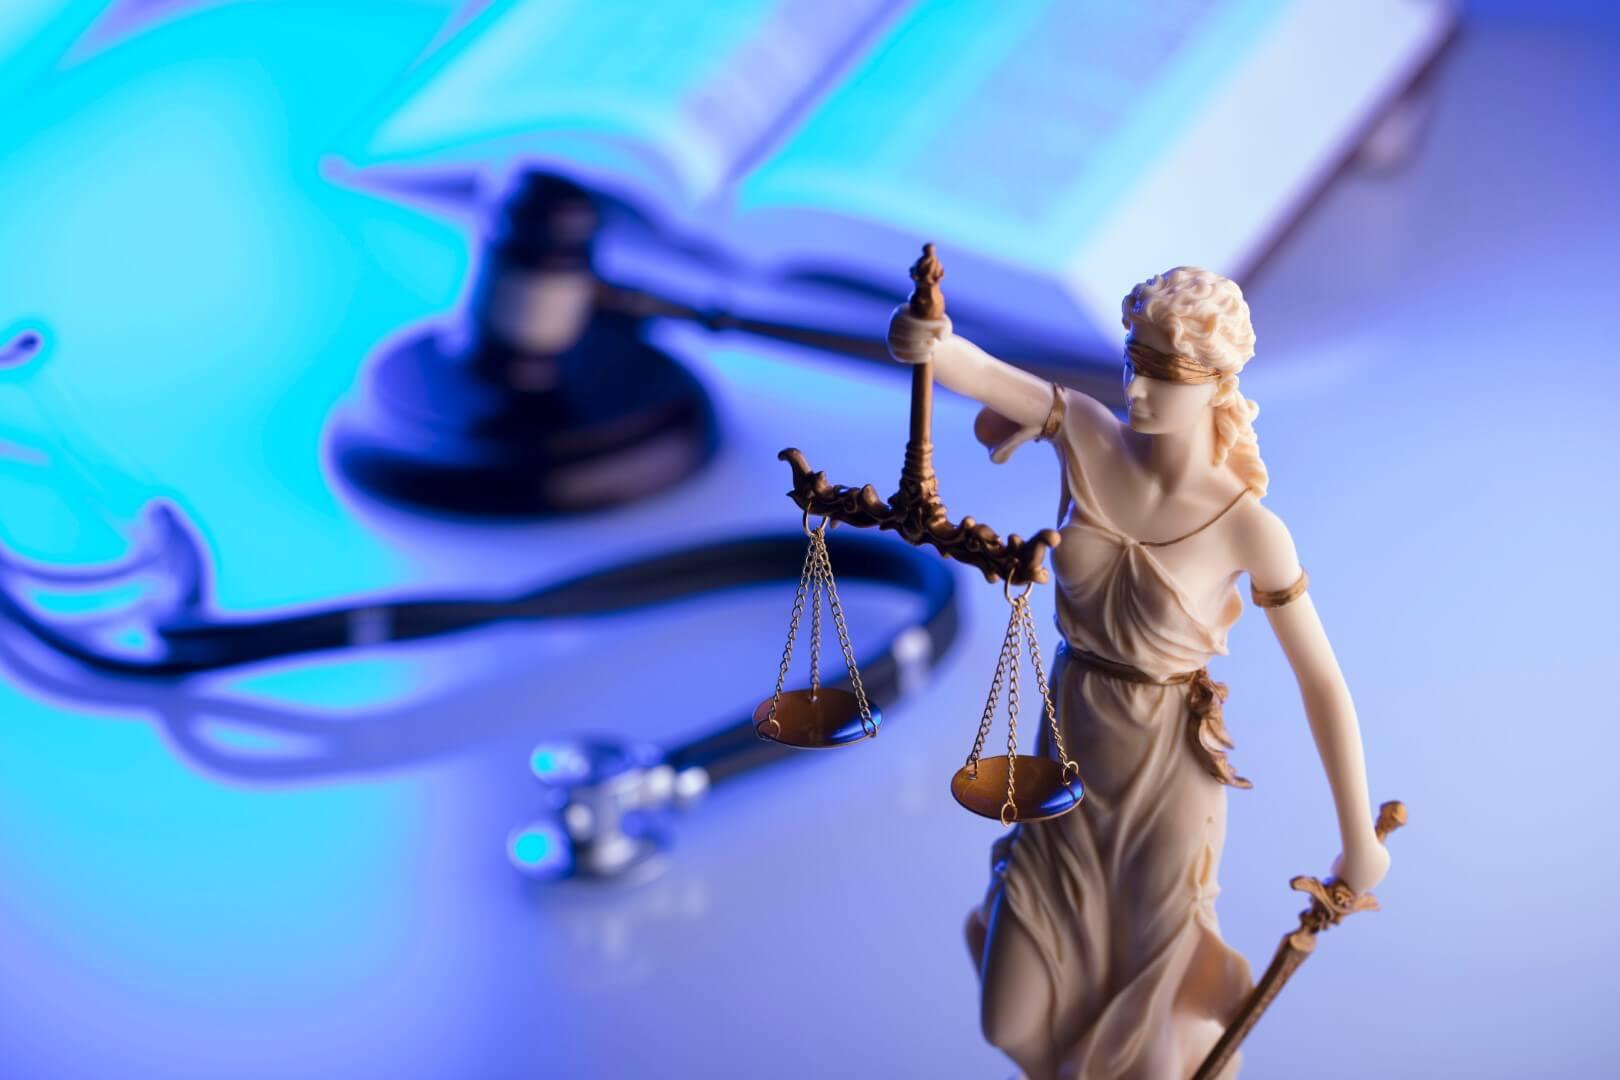 Medical legal justice